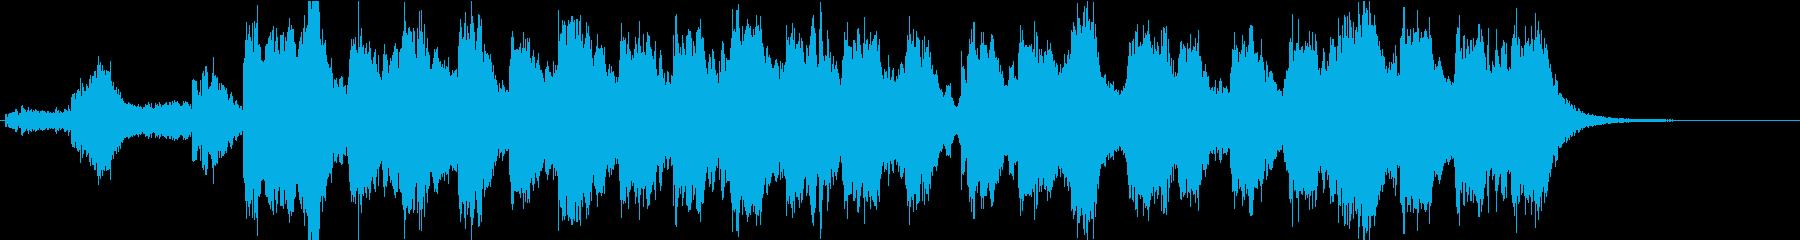 SFX映画に出てきそうな暗黒系BGMの再生済みの波形